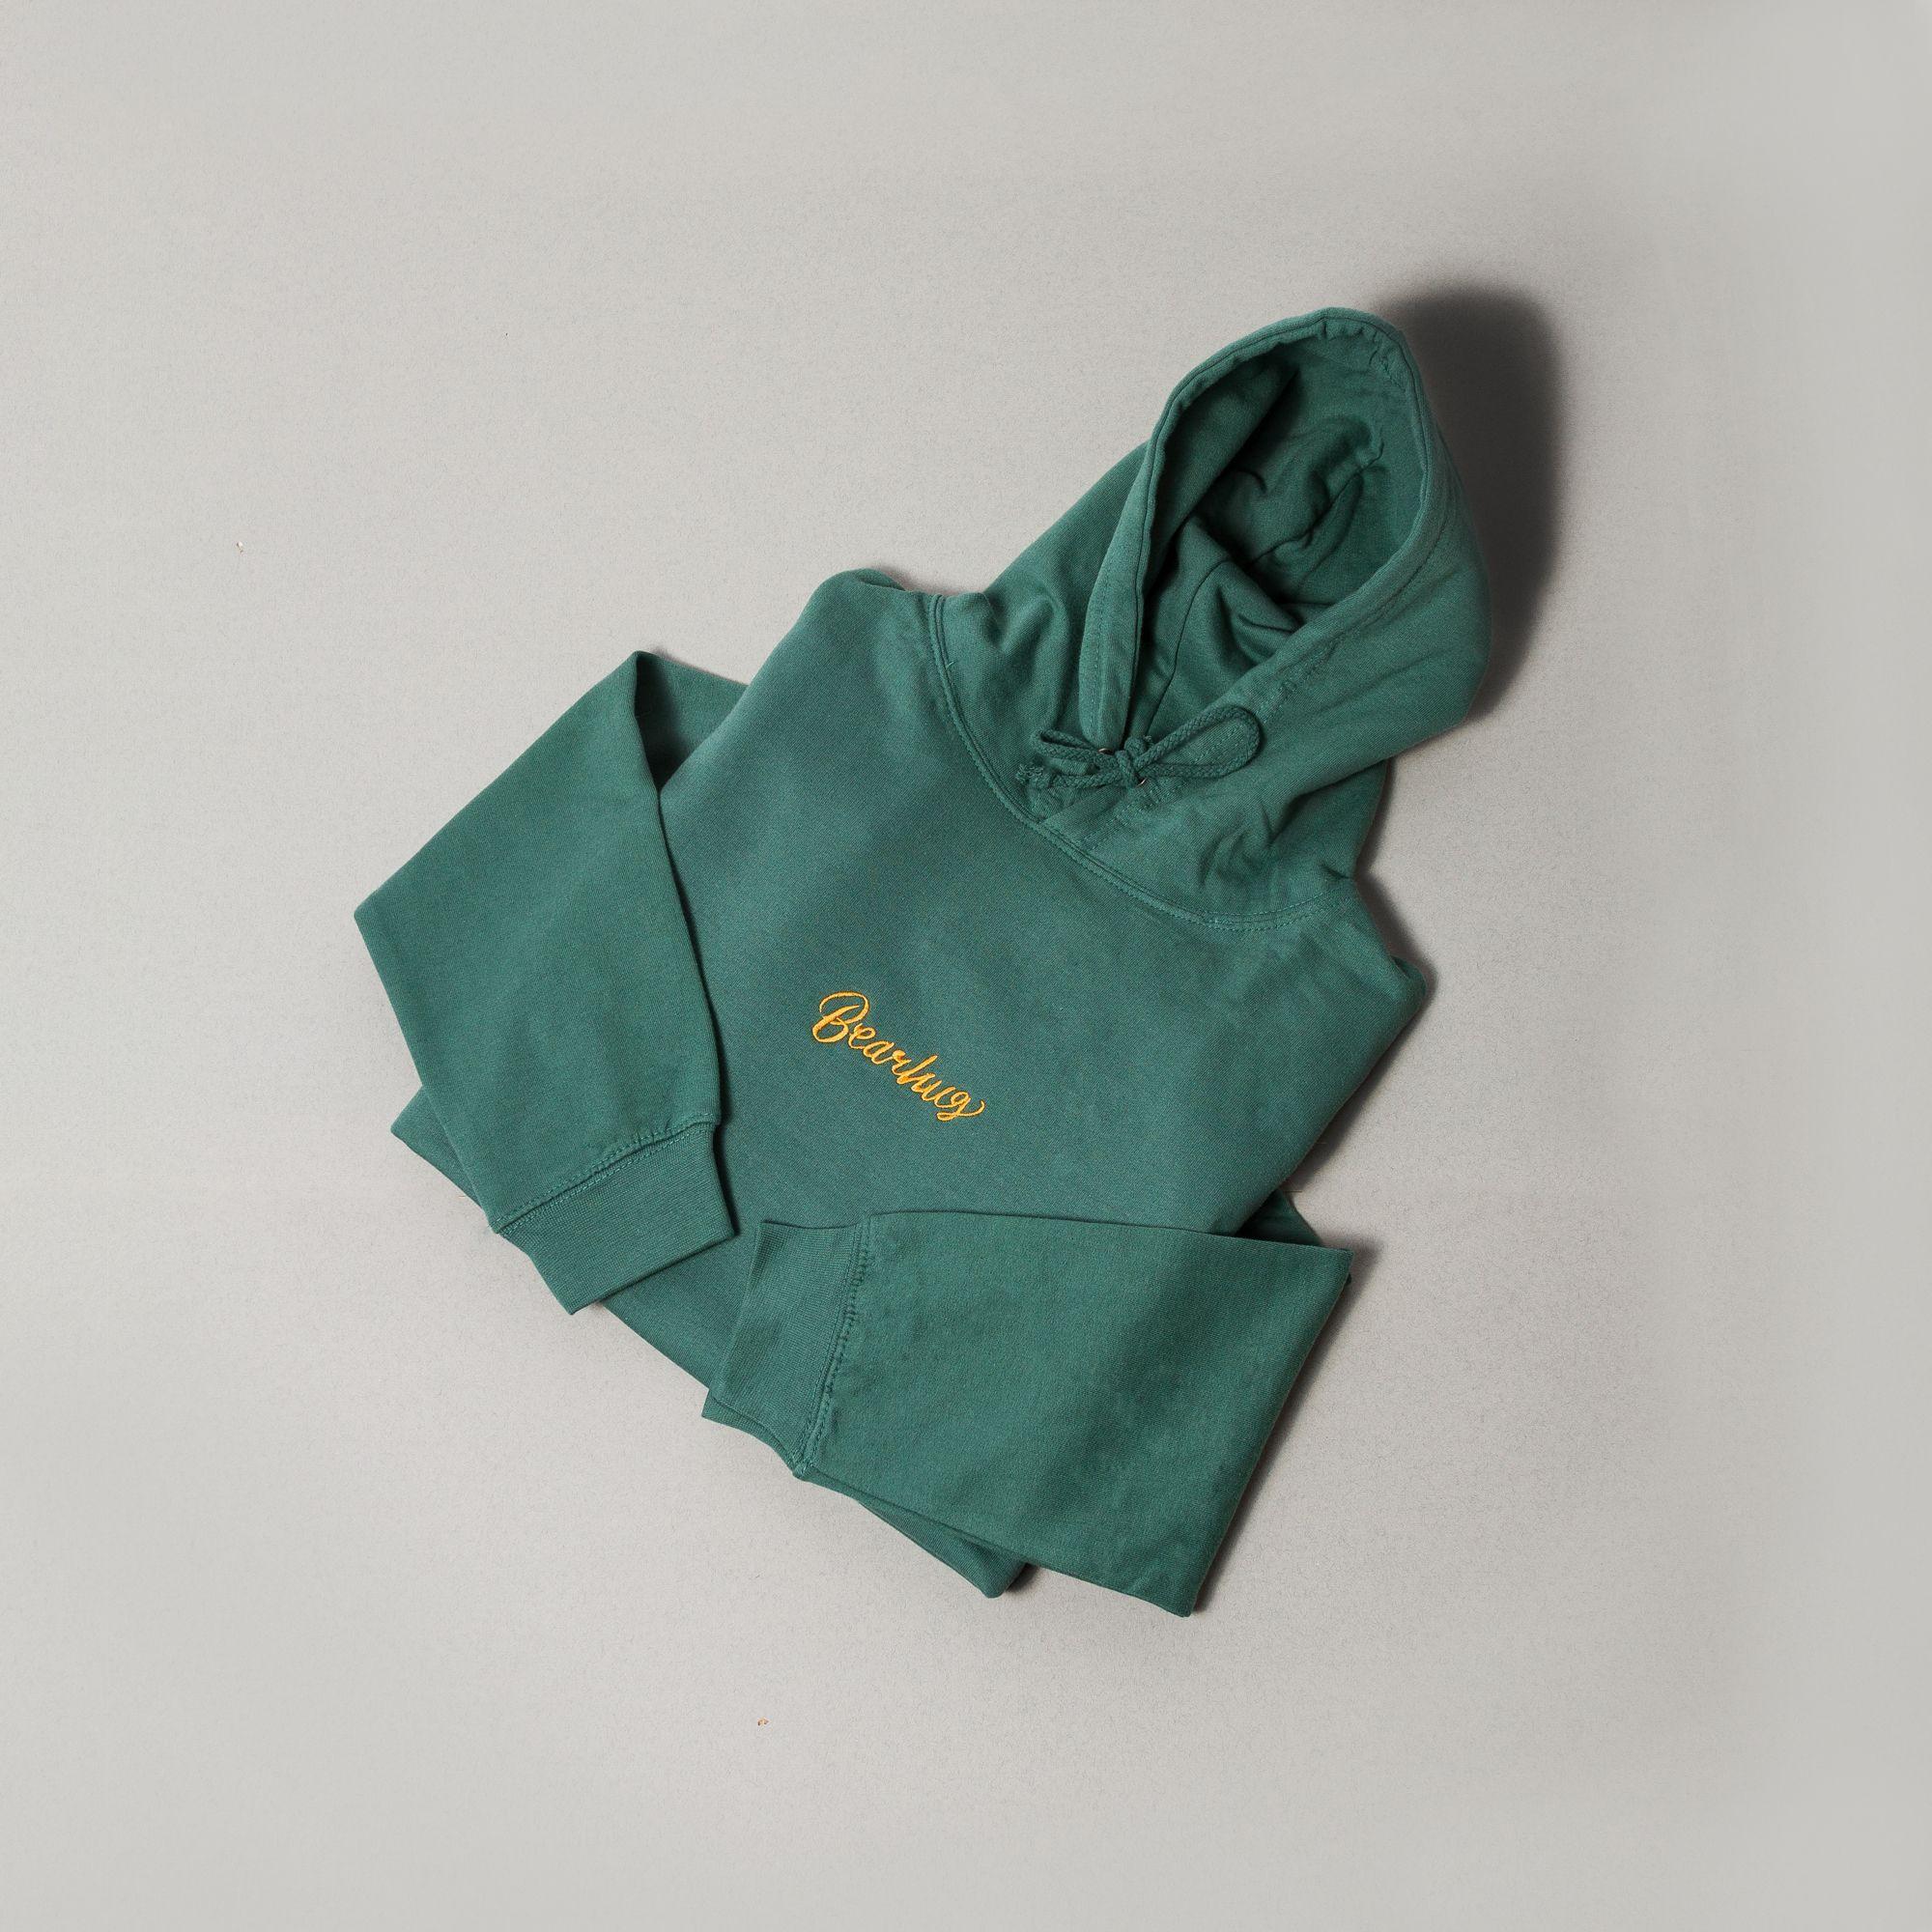 THE BEARHUG (CO.) LTD 'Script' Embroidered Logo Hoodie